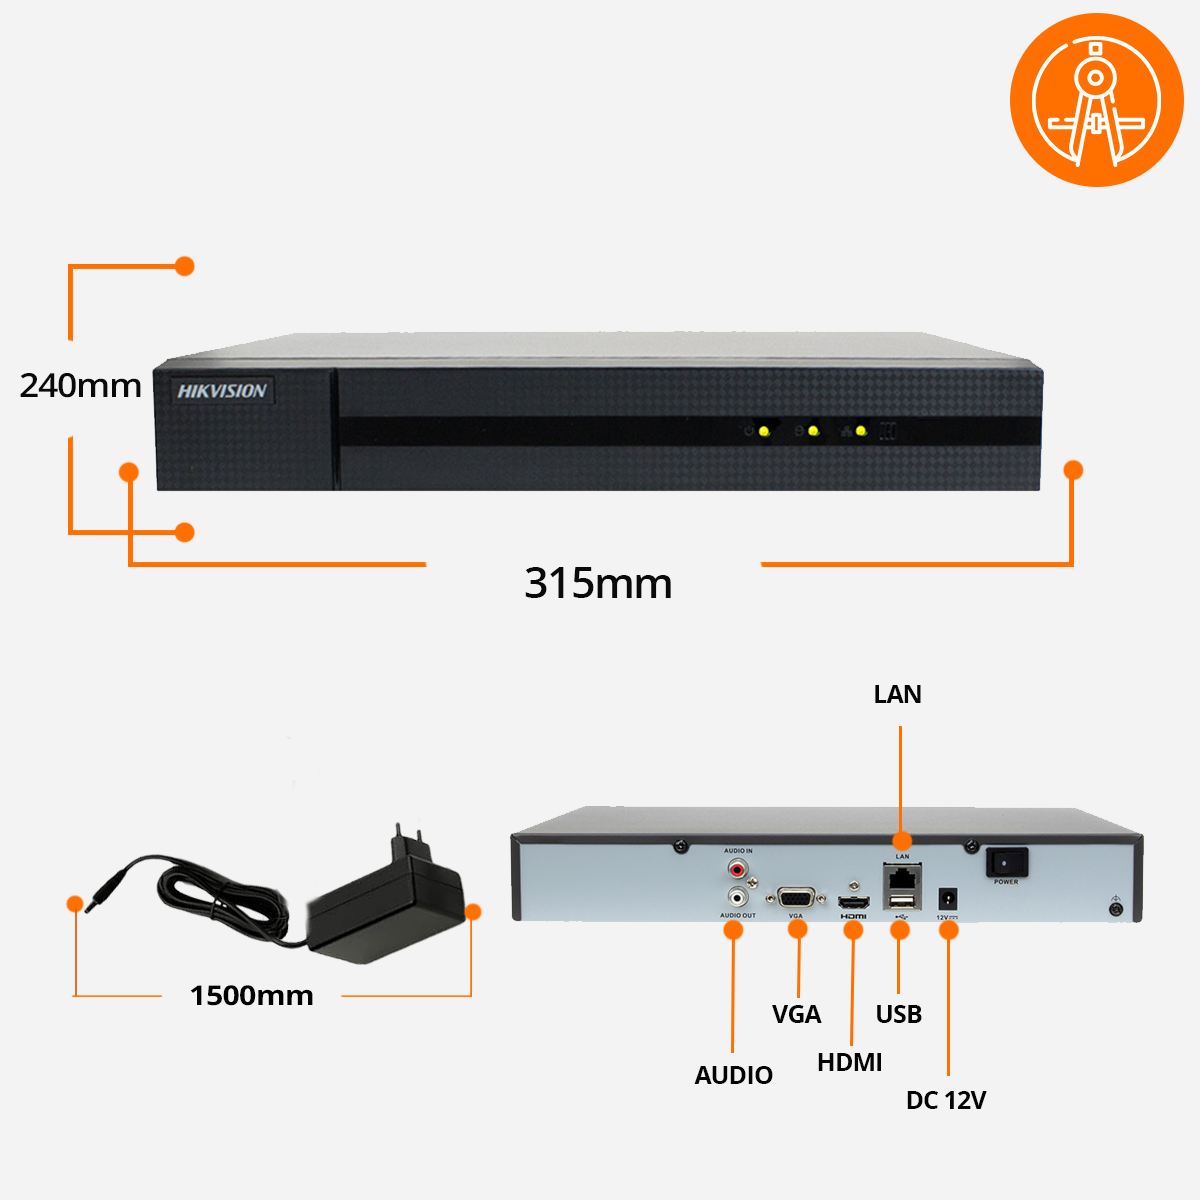 Rejestrator NVR hikivision specyfikacja